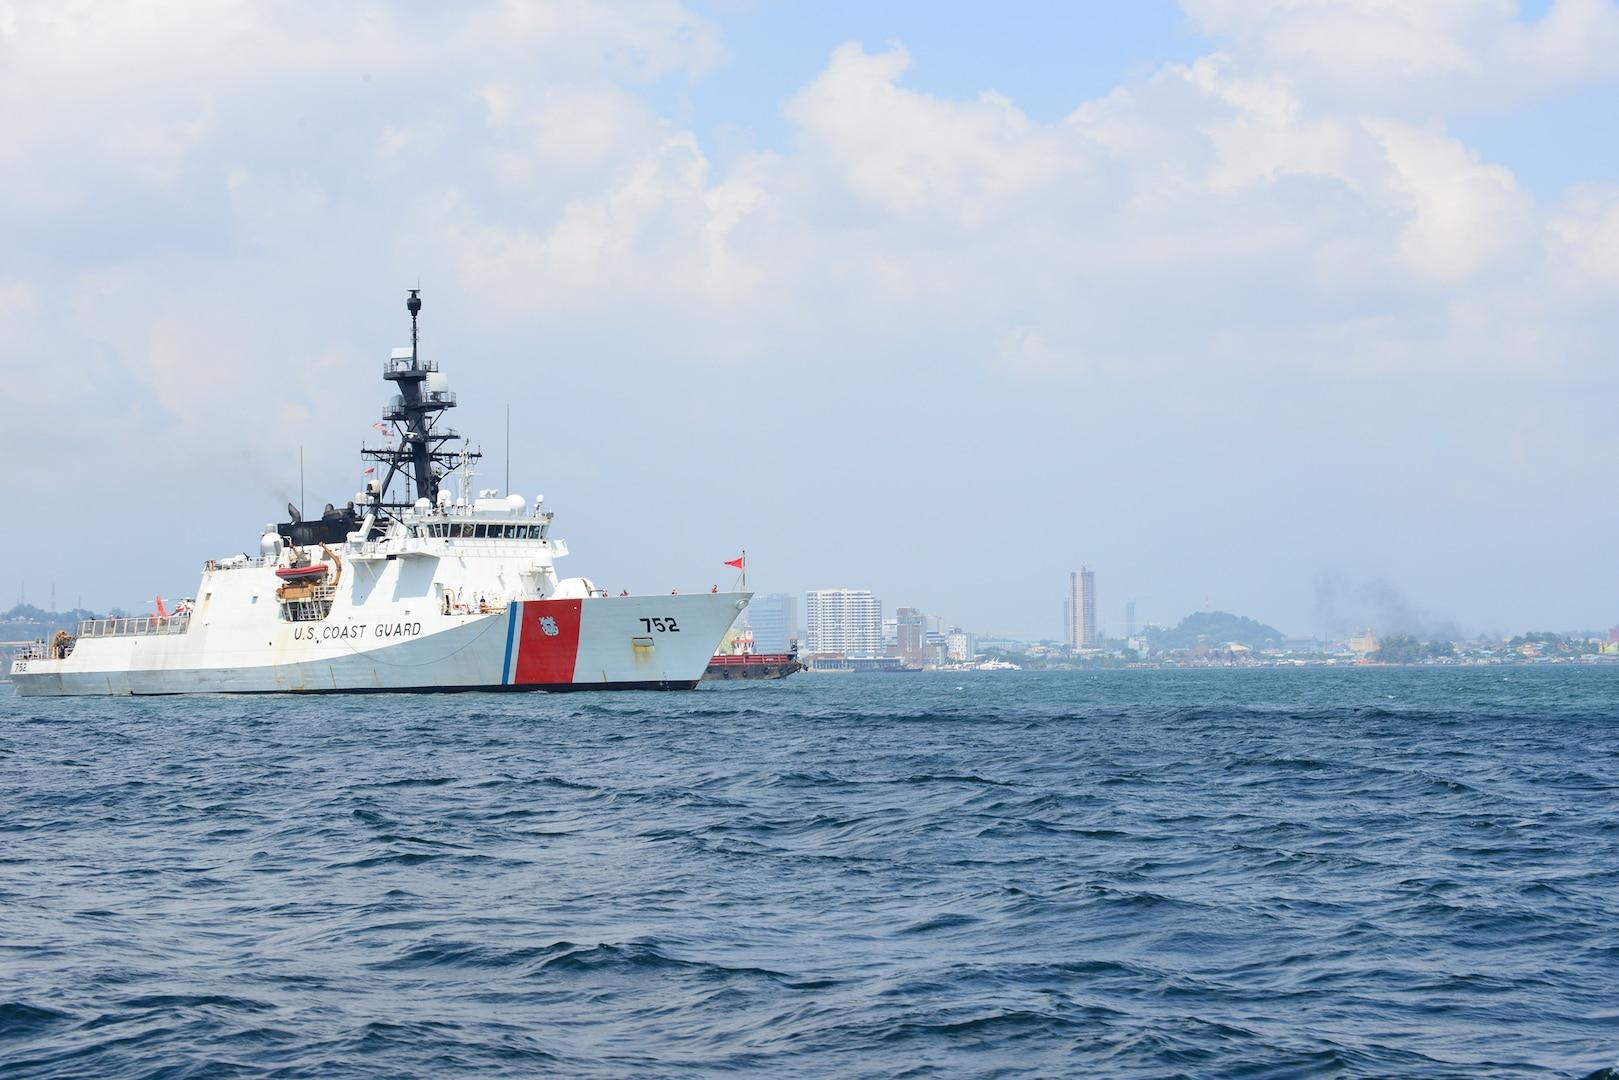 Coast Guard Cutter Stratton Arrives in Chennai, India